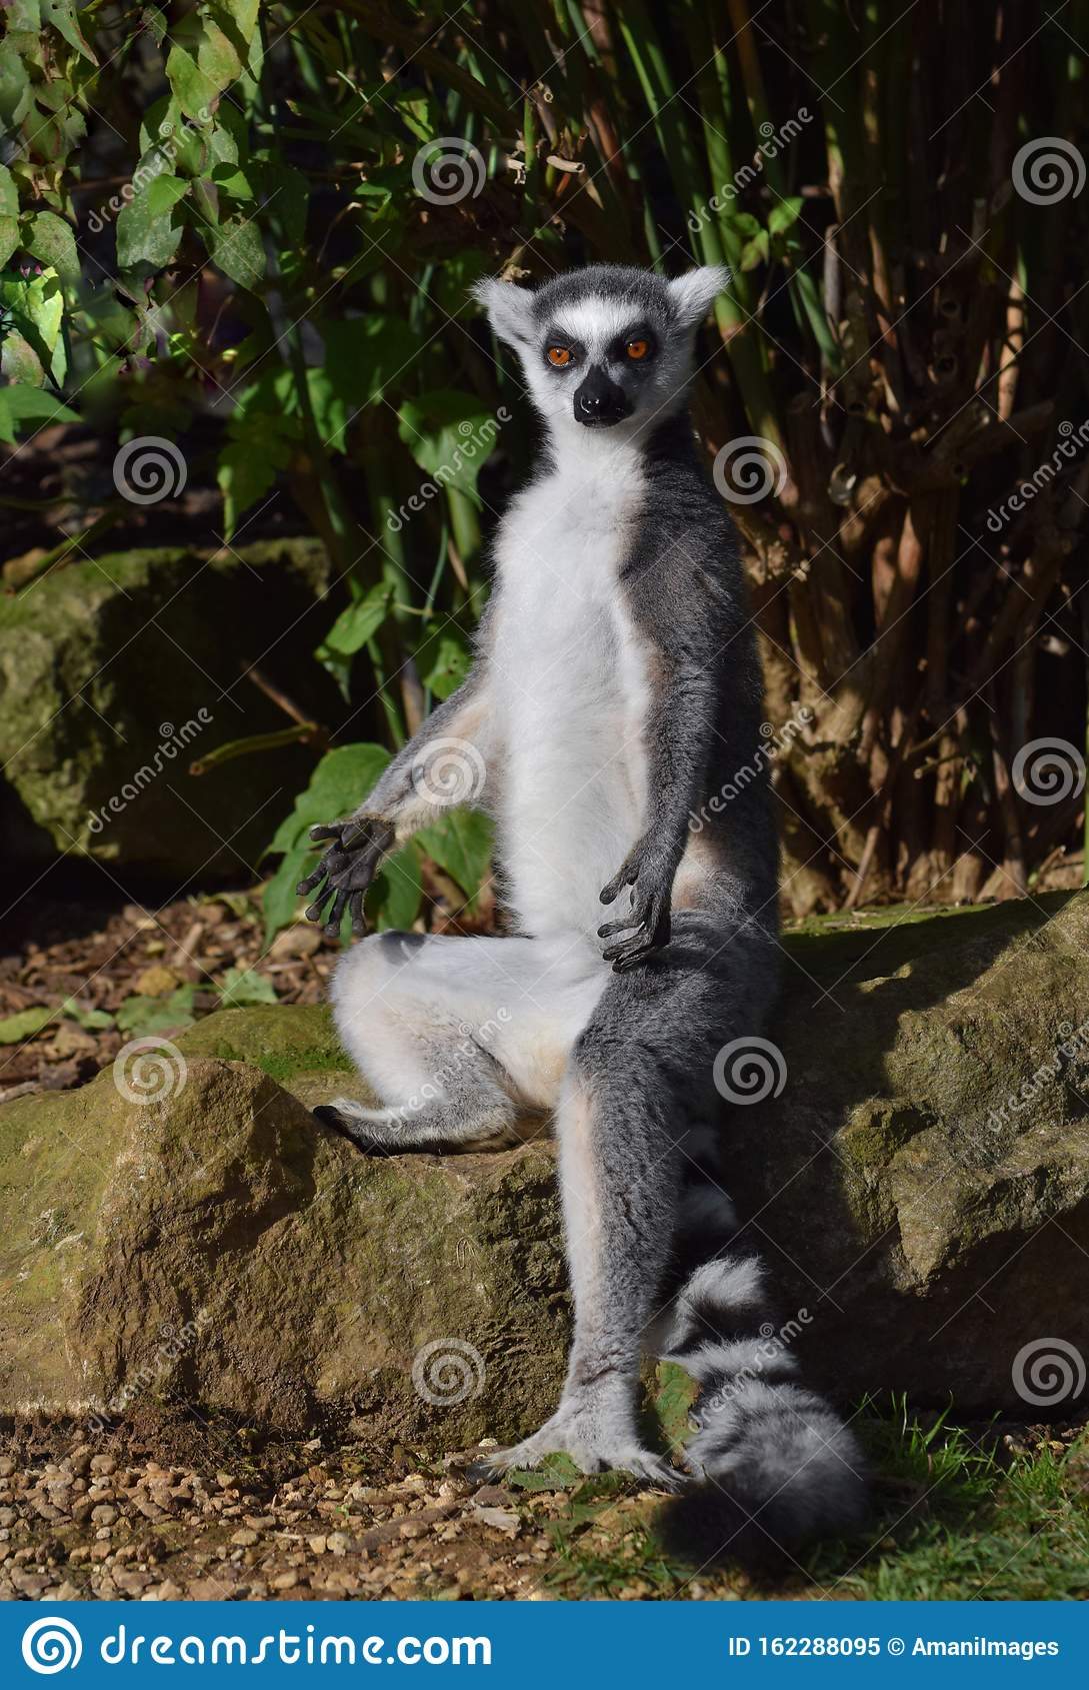 Ring tailed lemur sitting in a yoga type pose